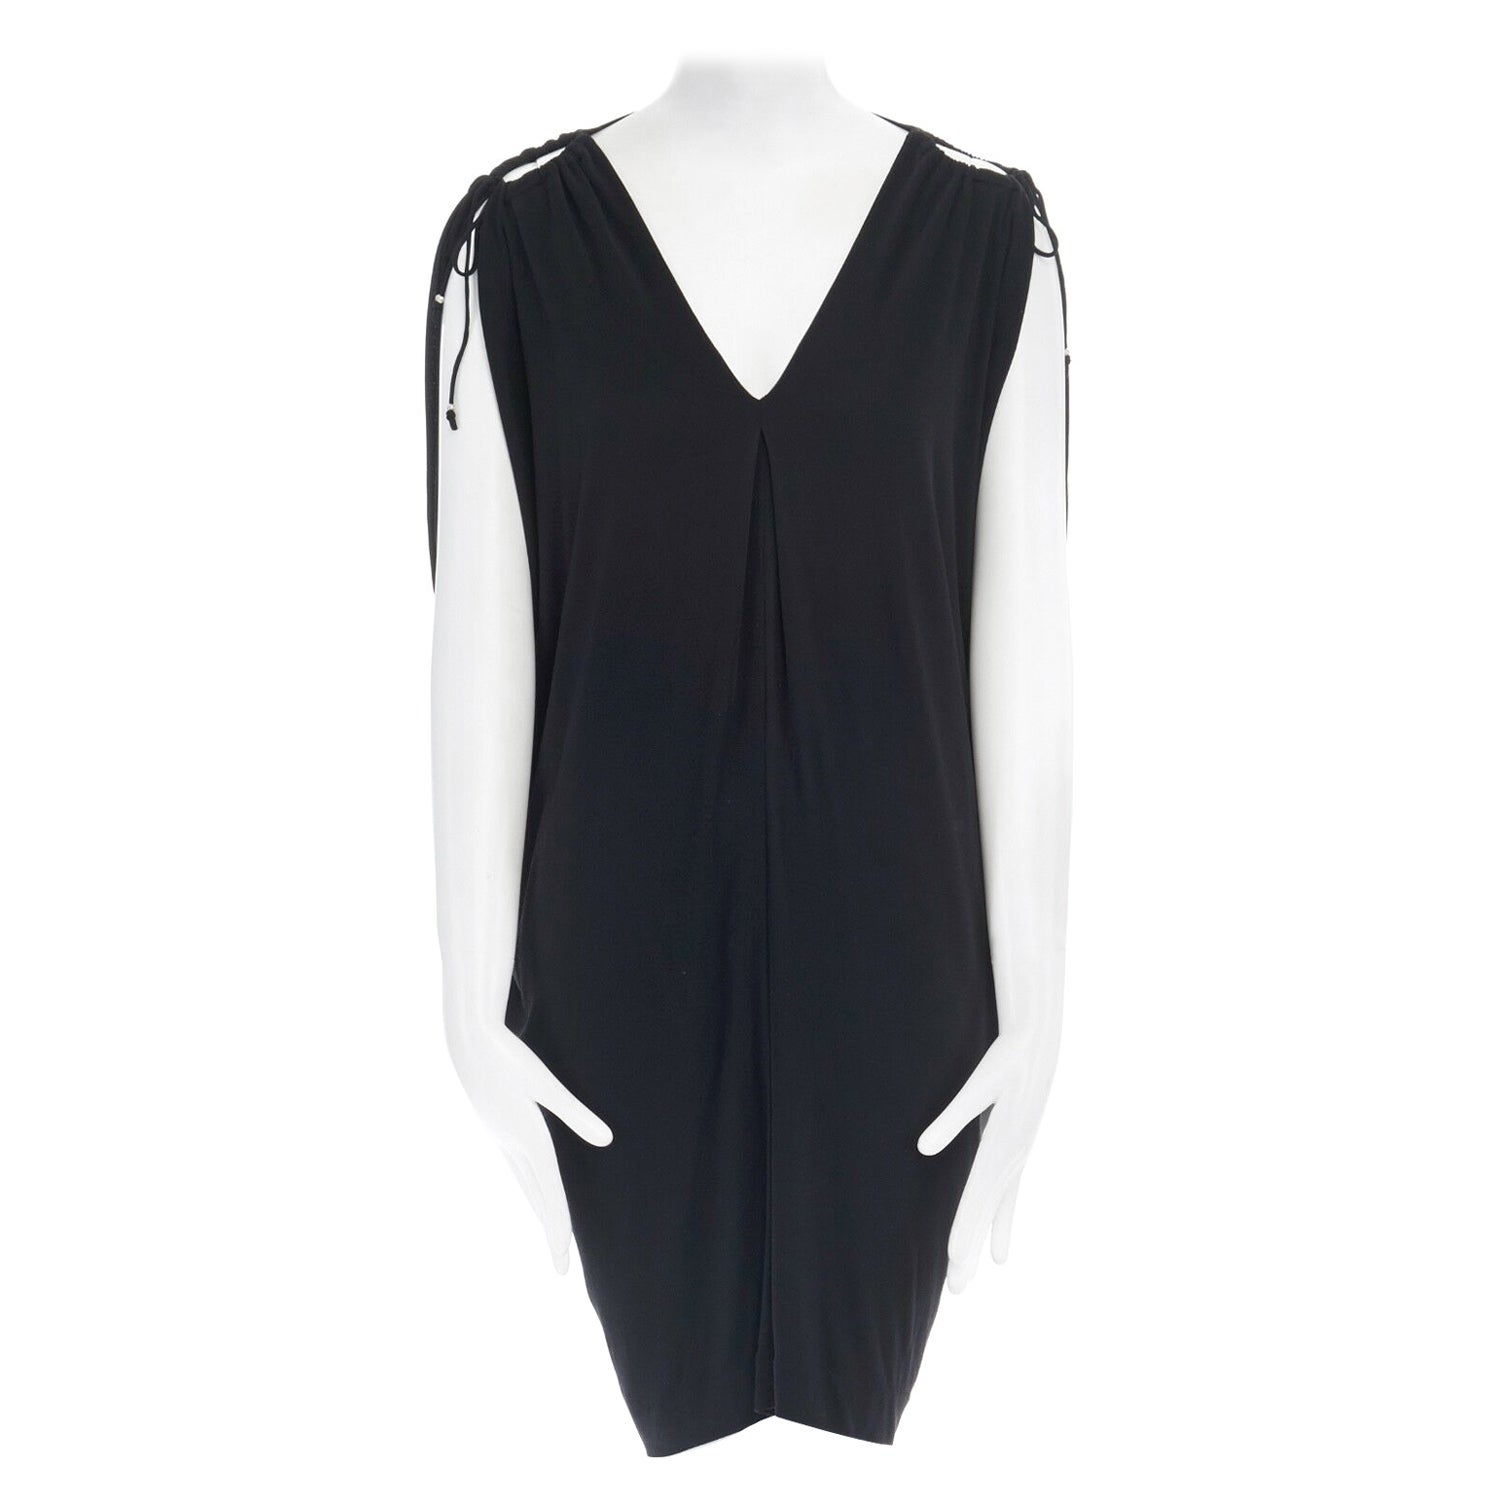 DIANE VON FUSTENBERG black grecian draped cold shoulder sleeveless dress US4 S